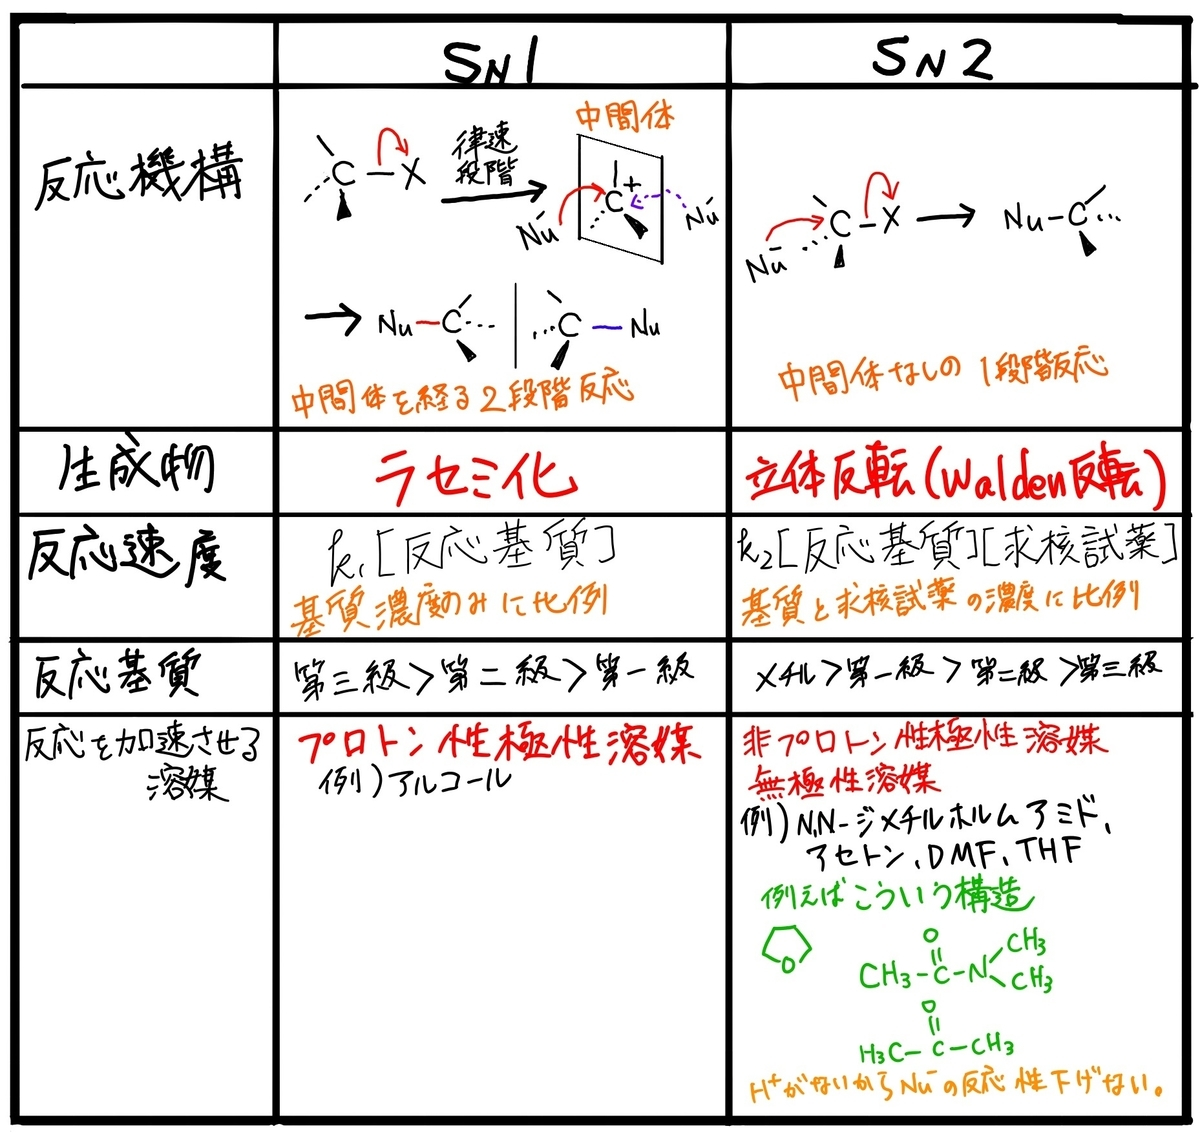 f:id:mofumushi:20210210111830j:plain